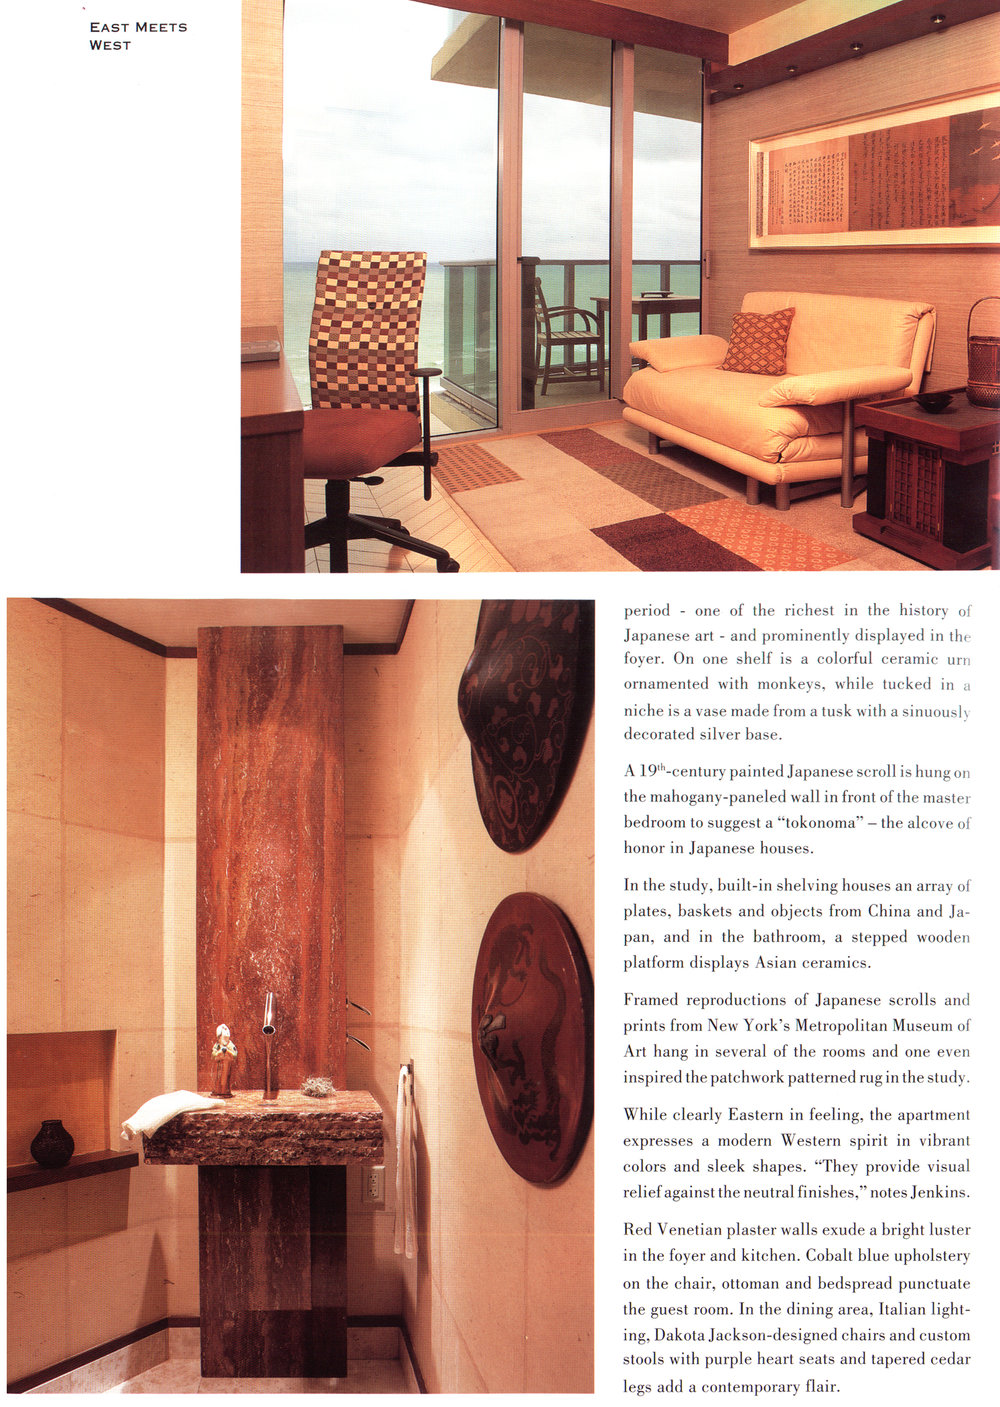 FA-page7 copy.jpg